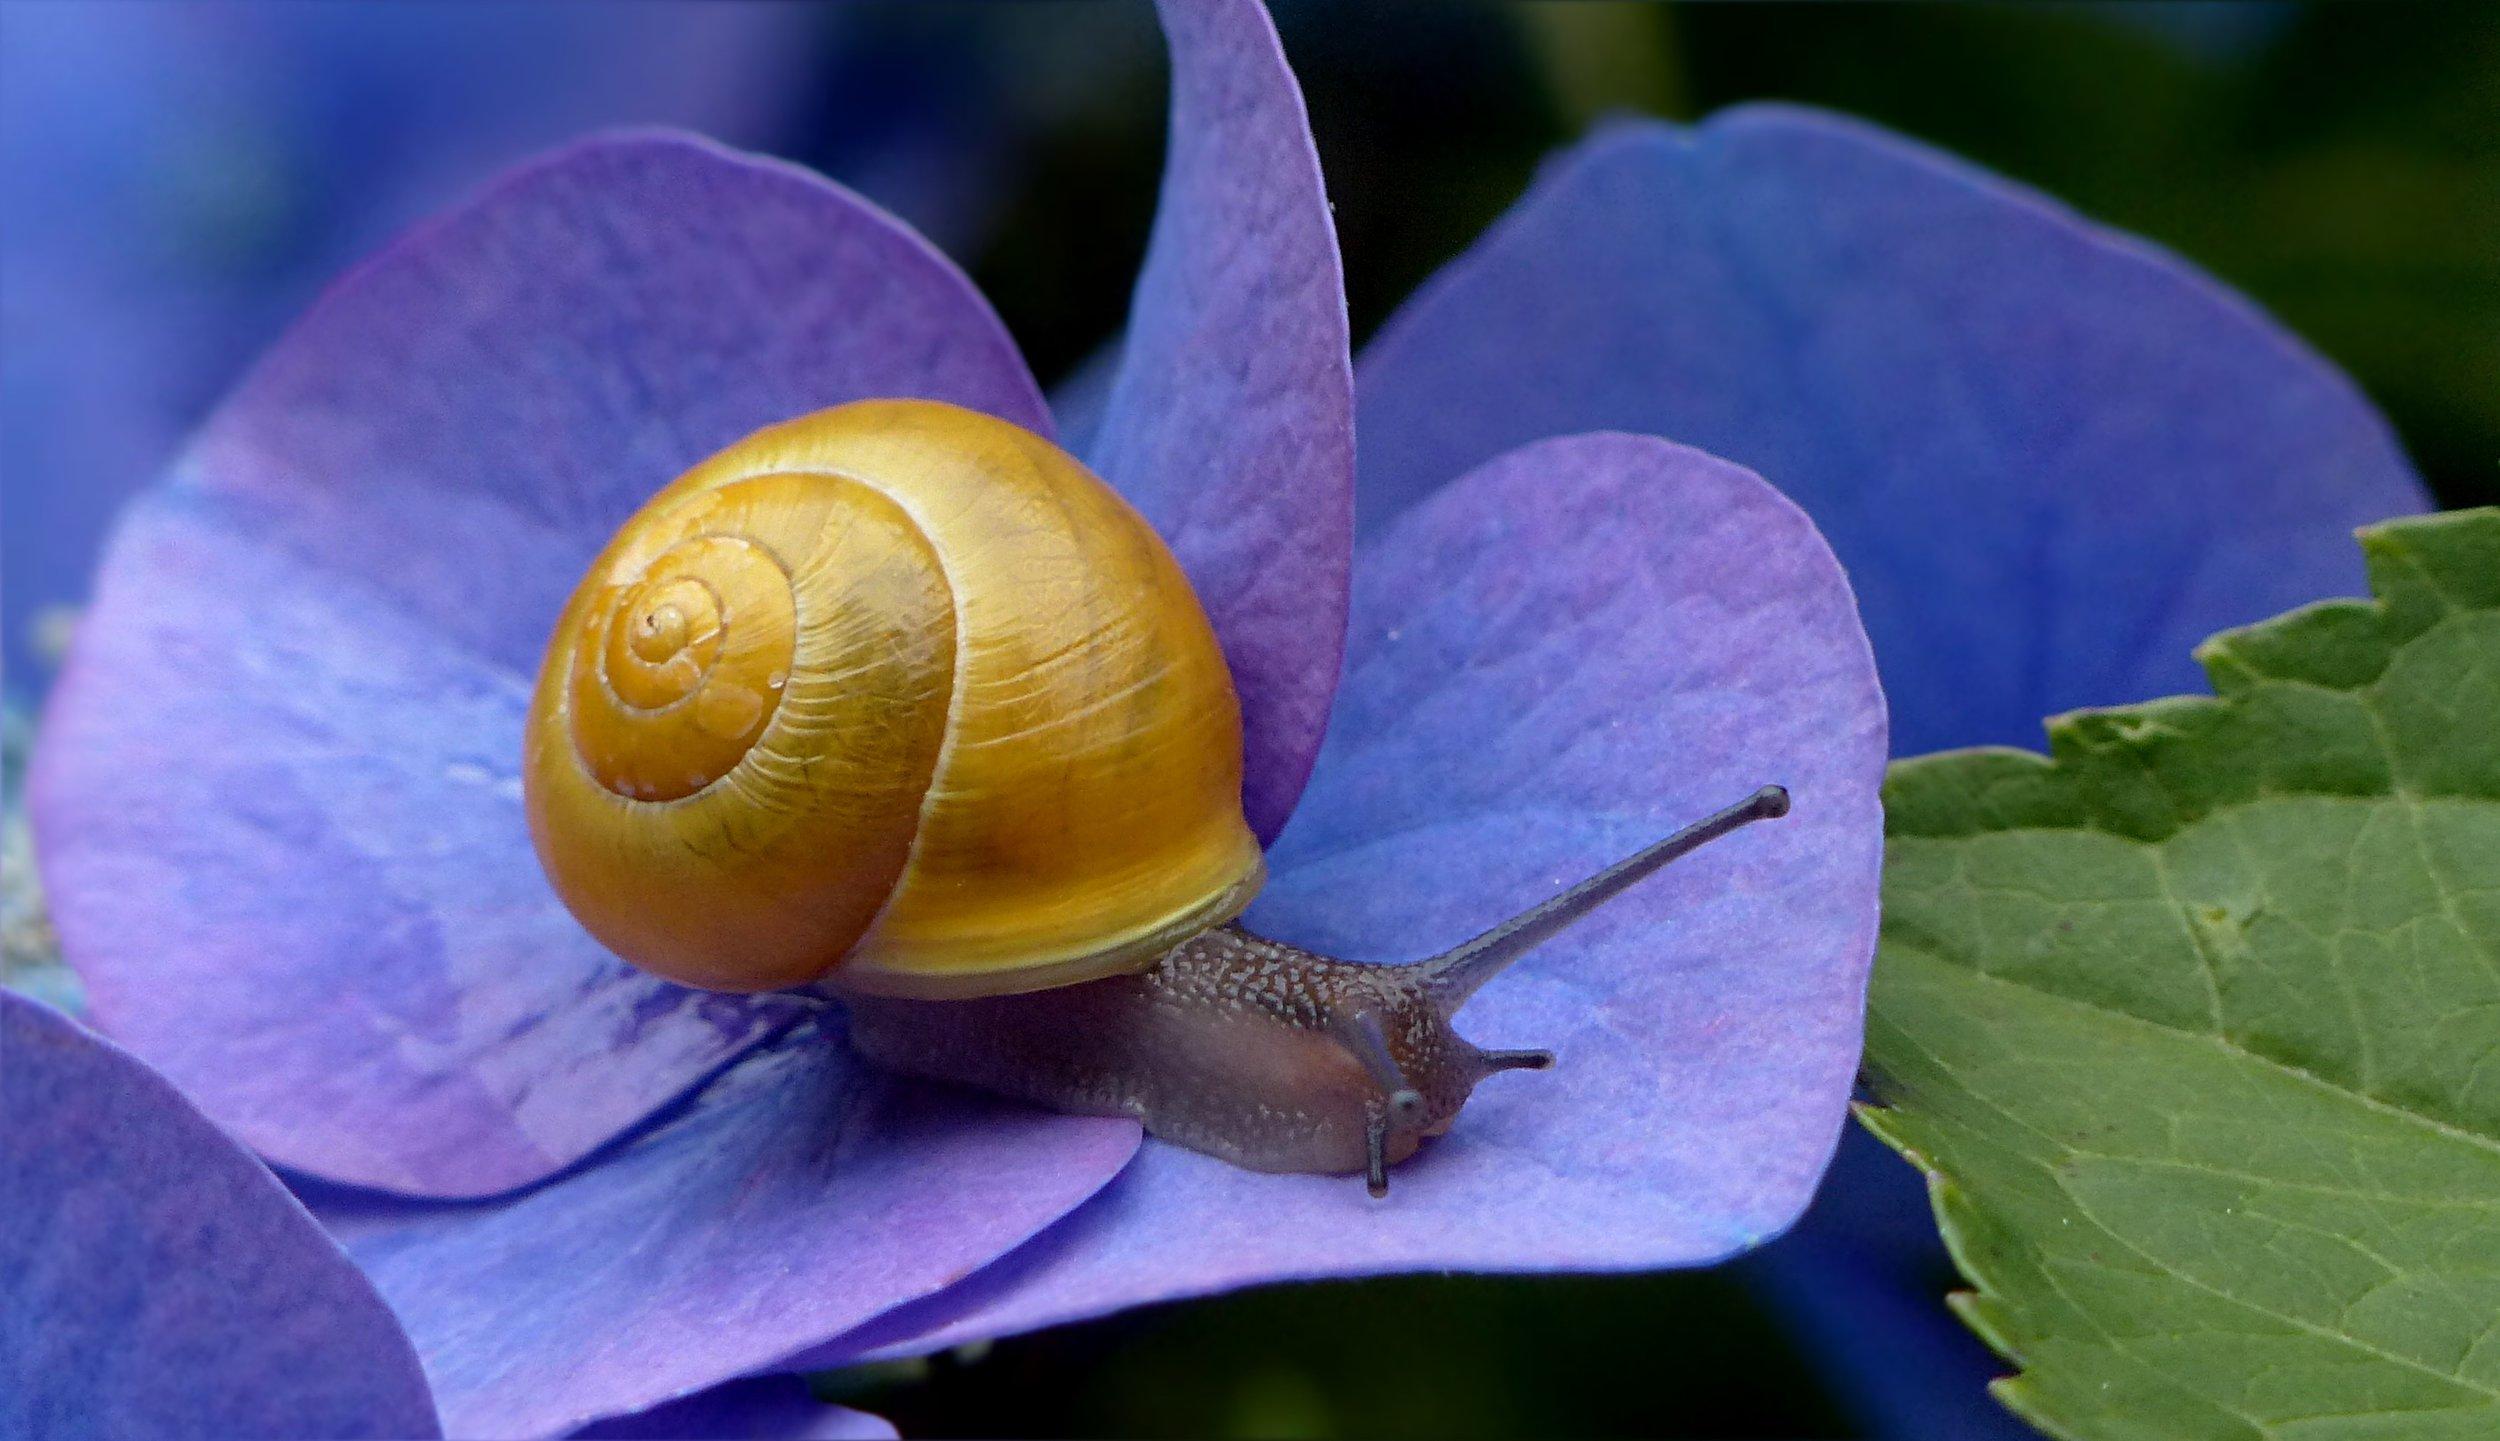 Snail Extract Soap